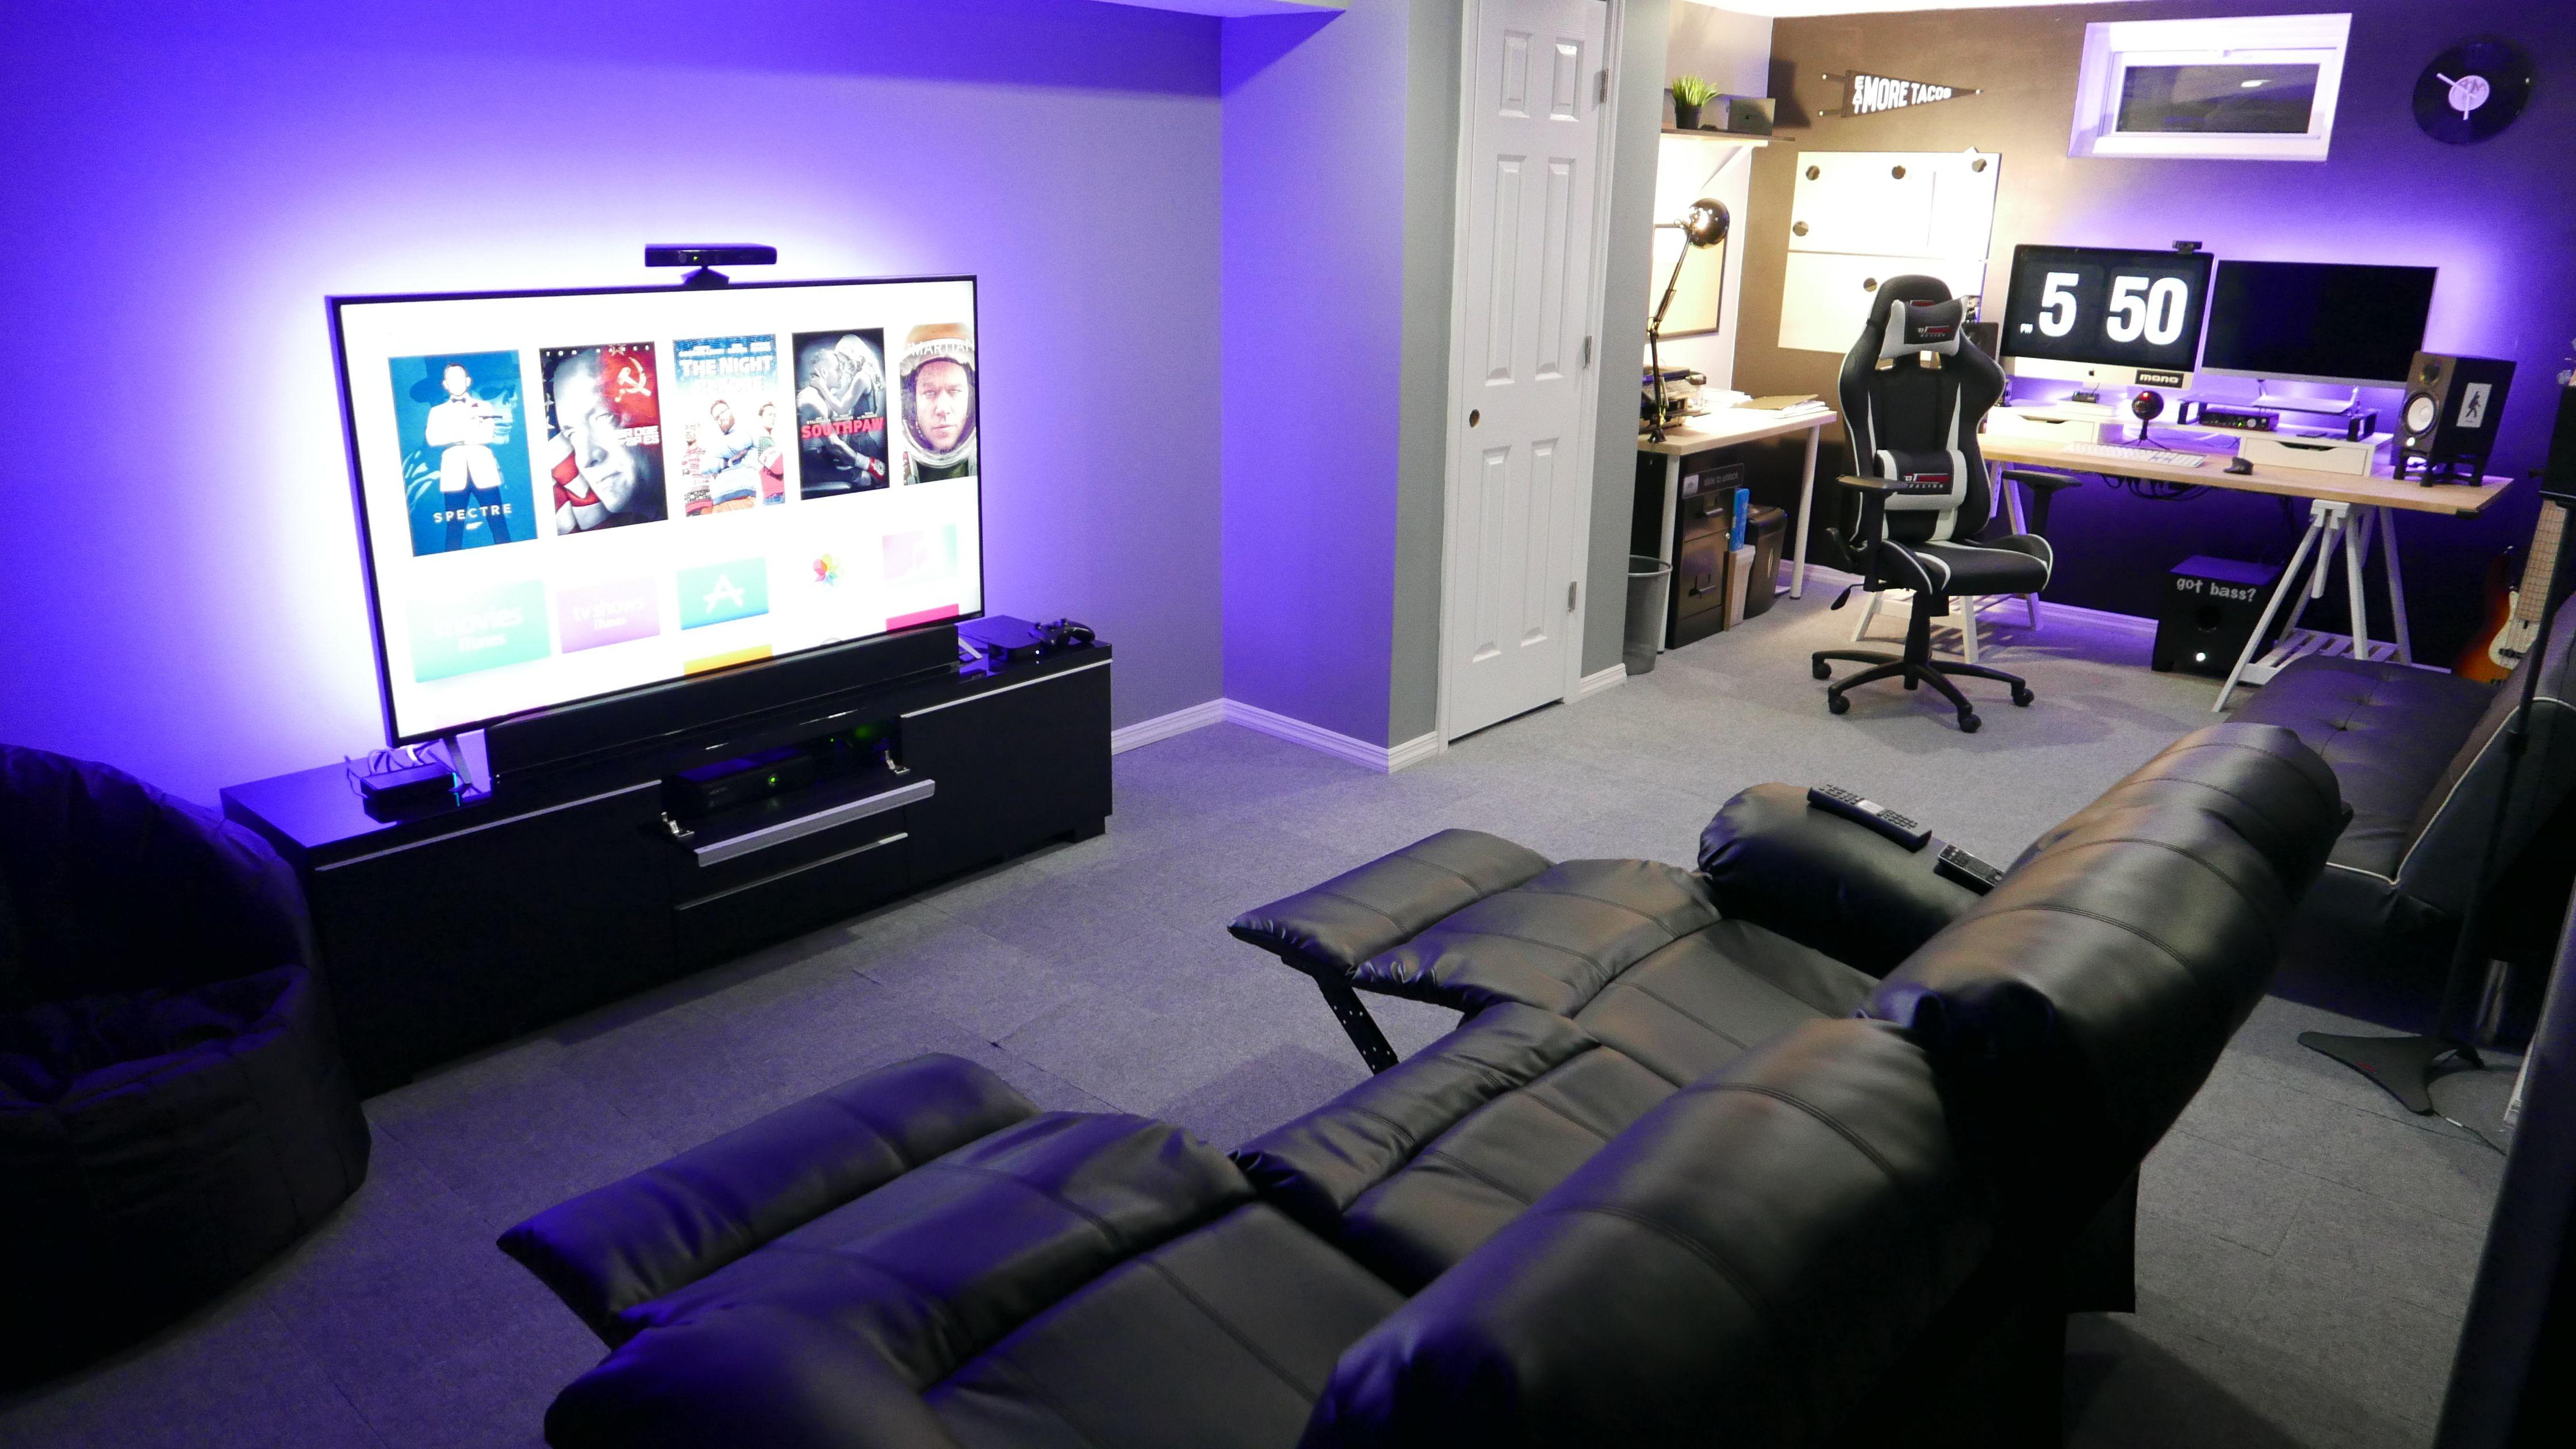 Man Cave Basement Office Gamer Room Entertainment Room Game